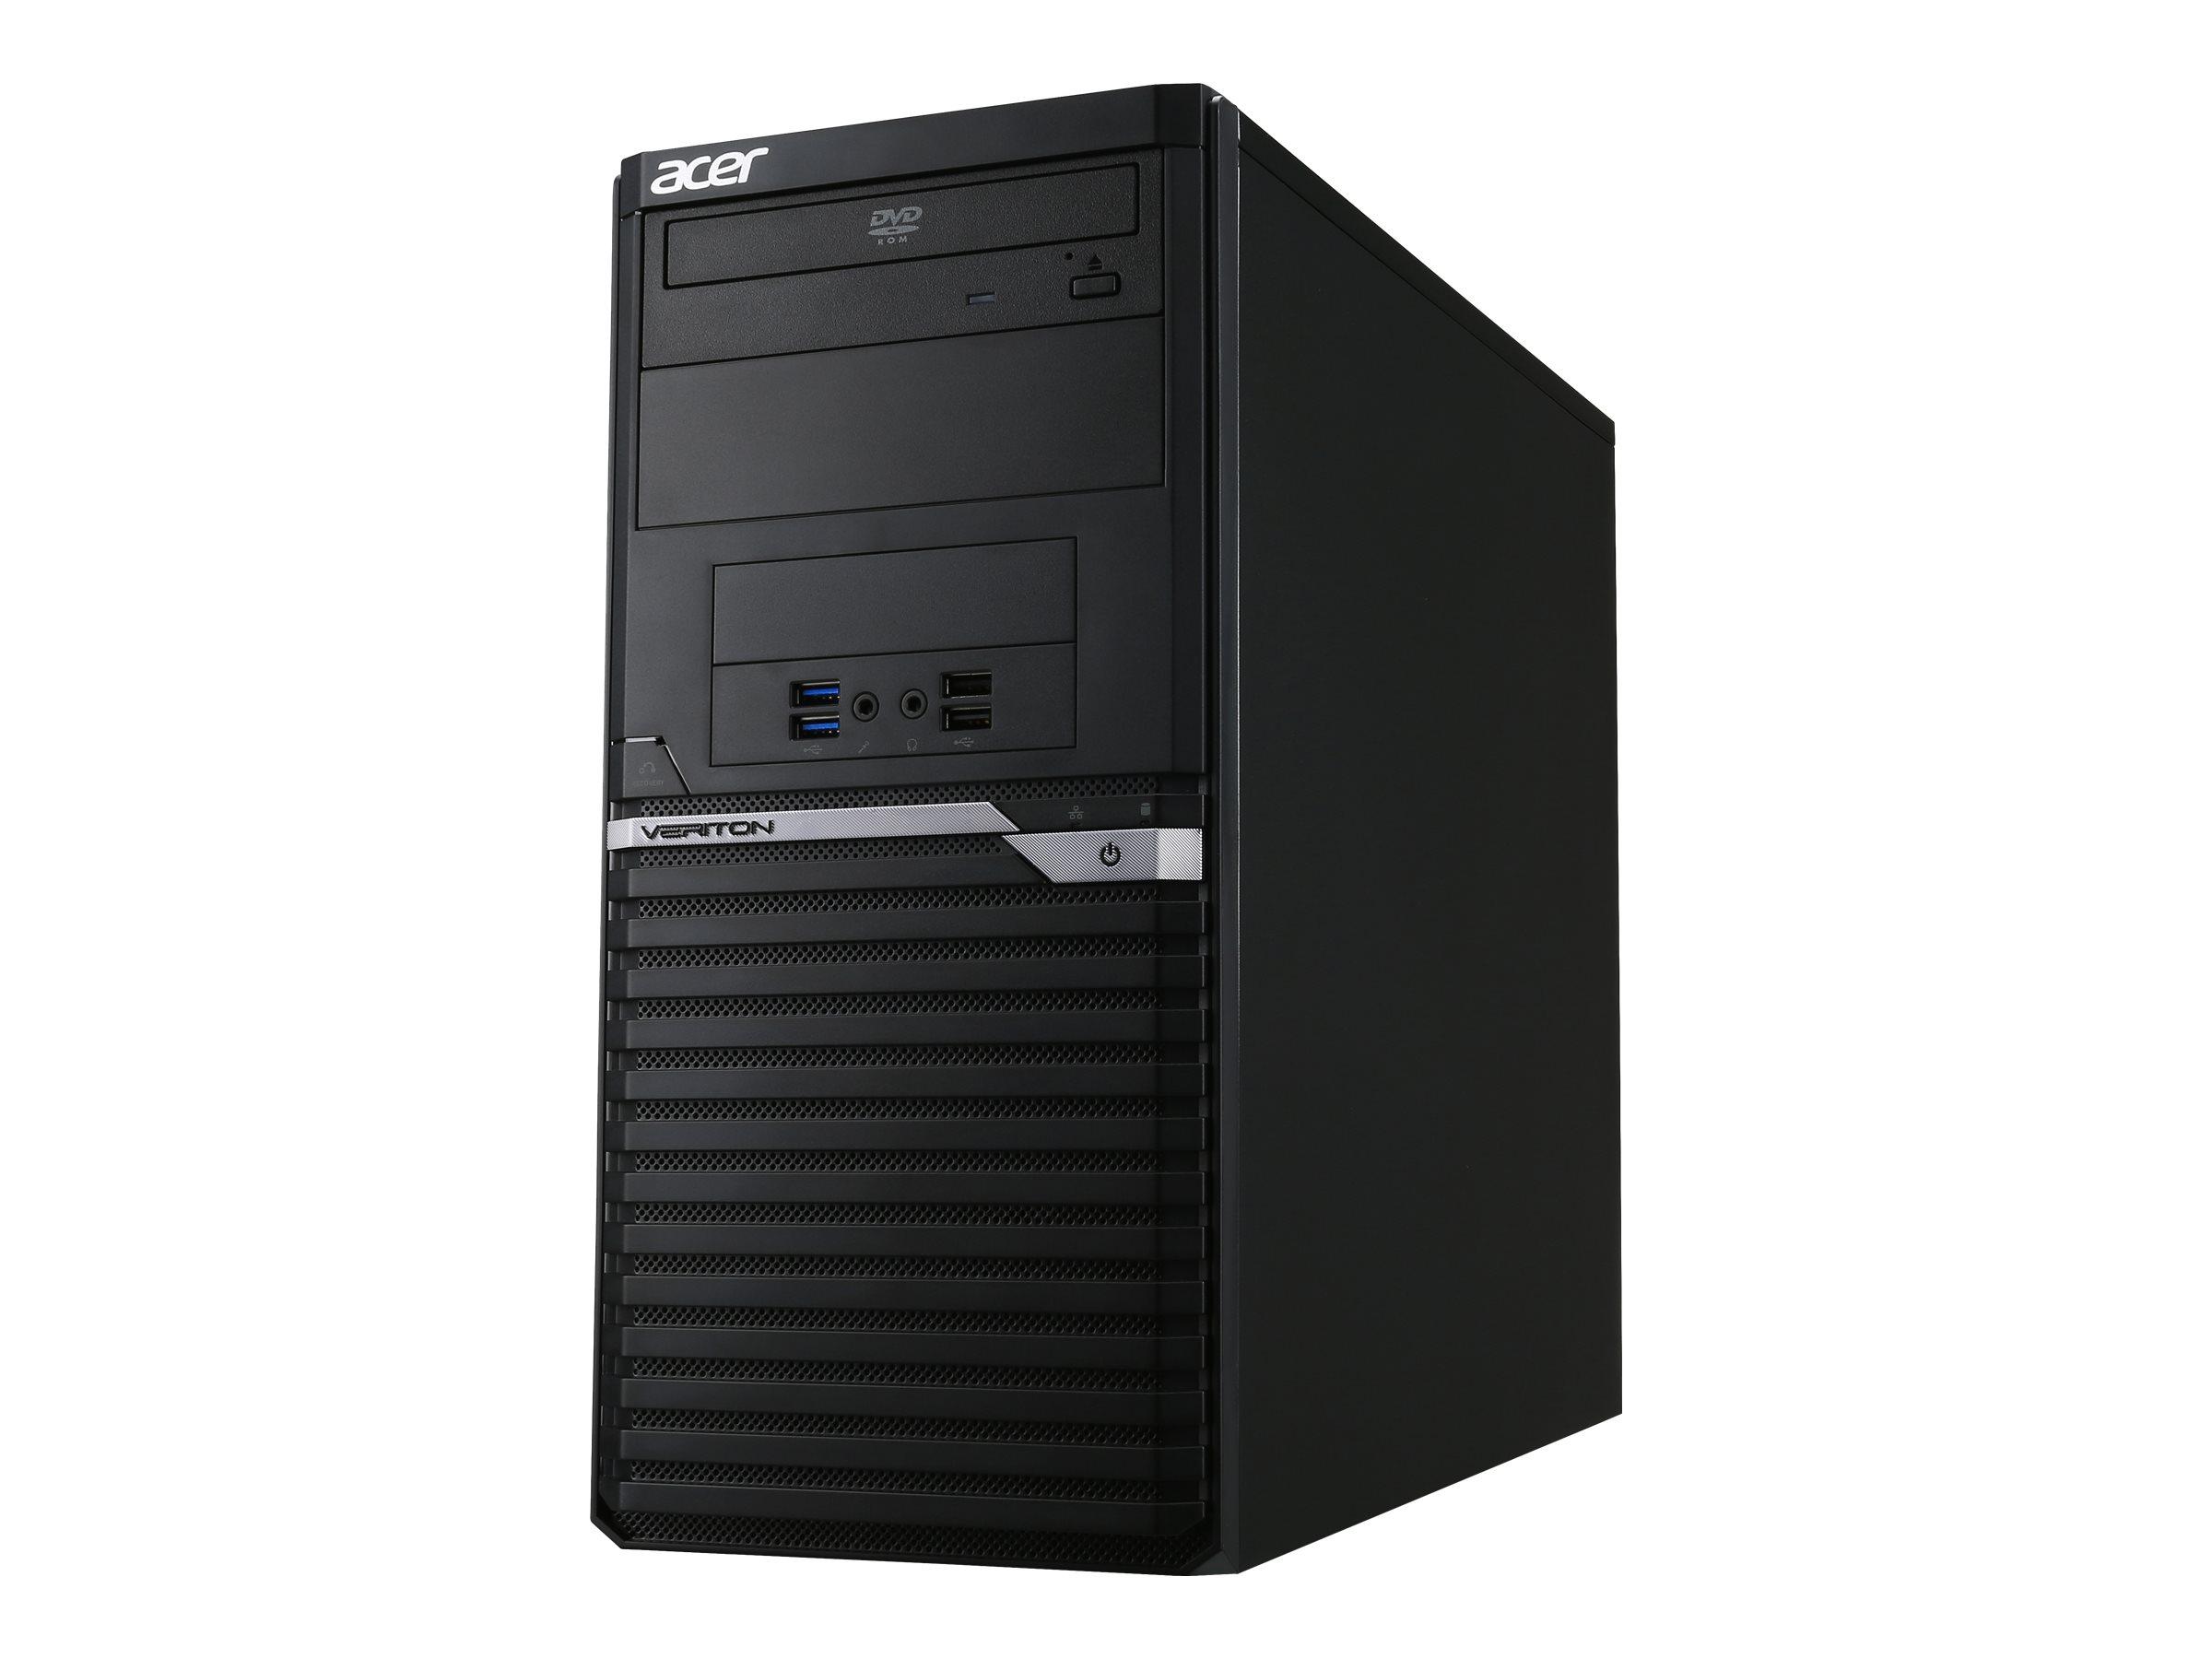 Acer Veriton M6 VM6660G - MT - Core i5 9400 / 2.9 GHz